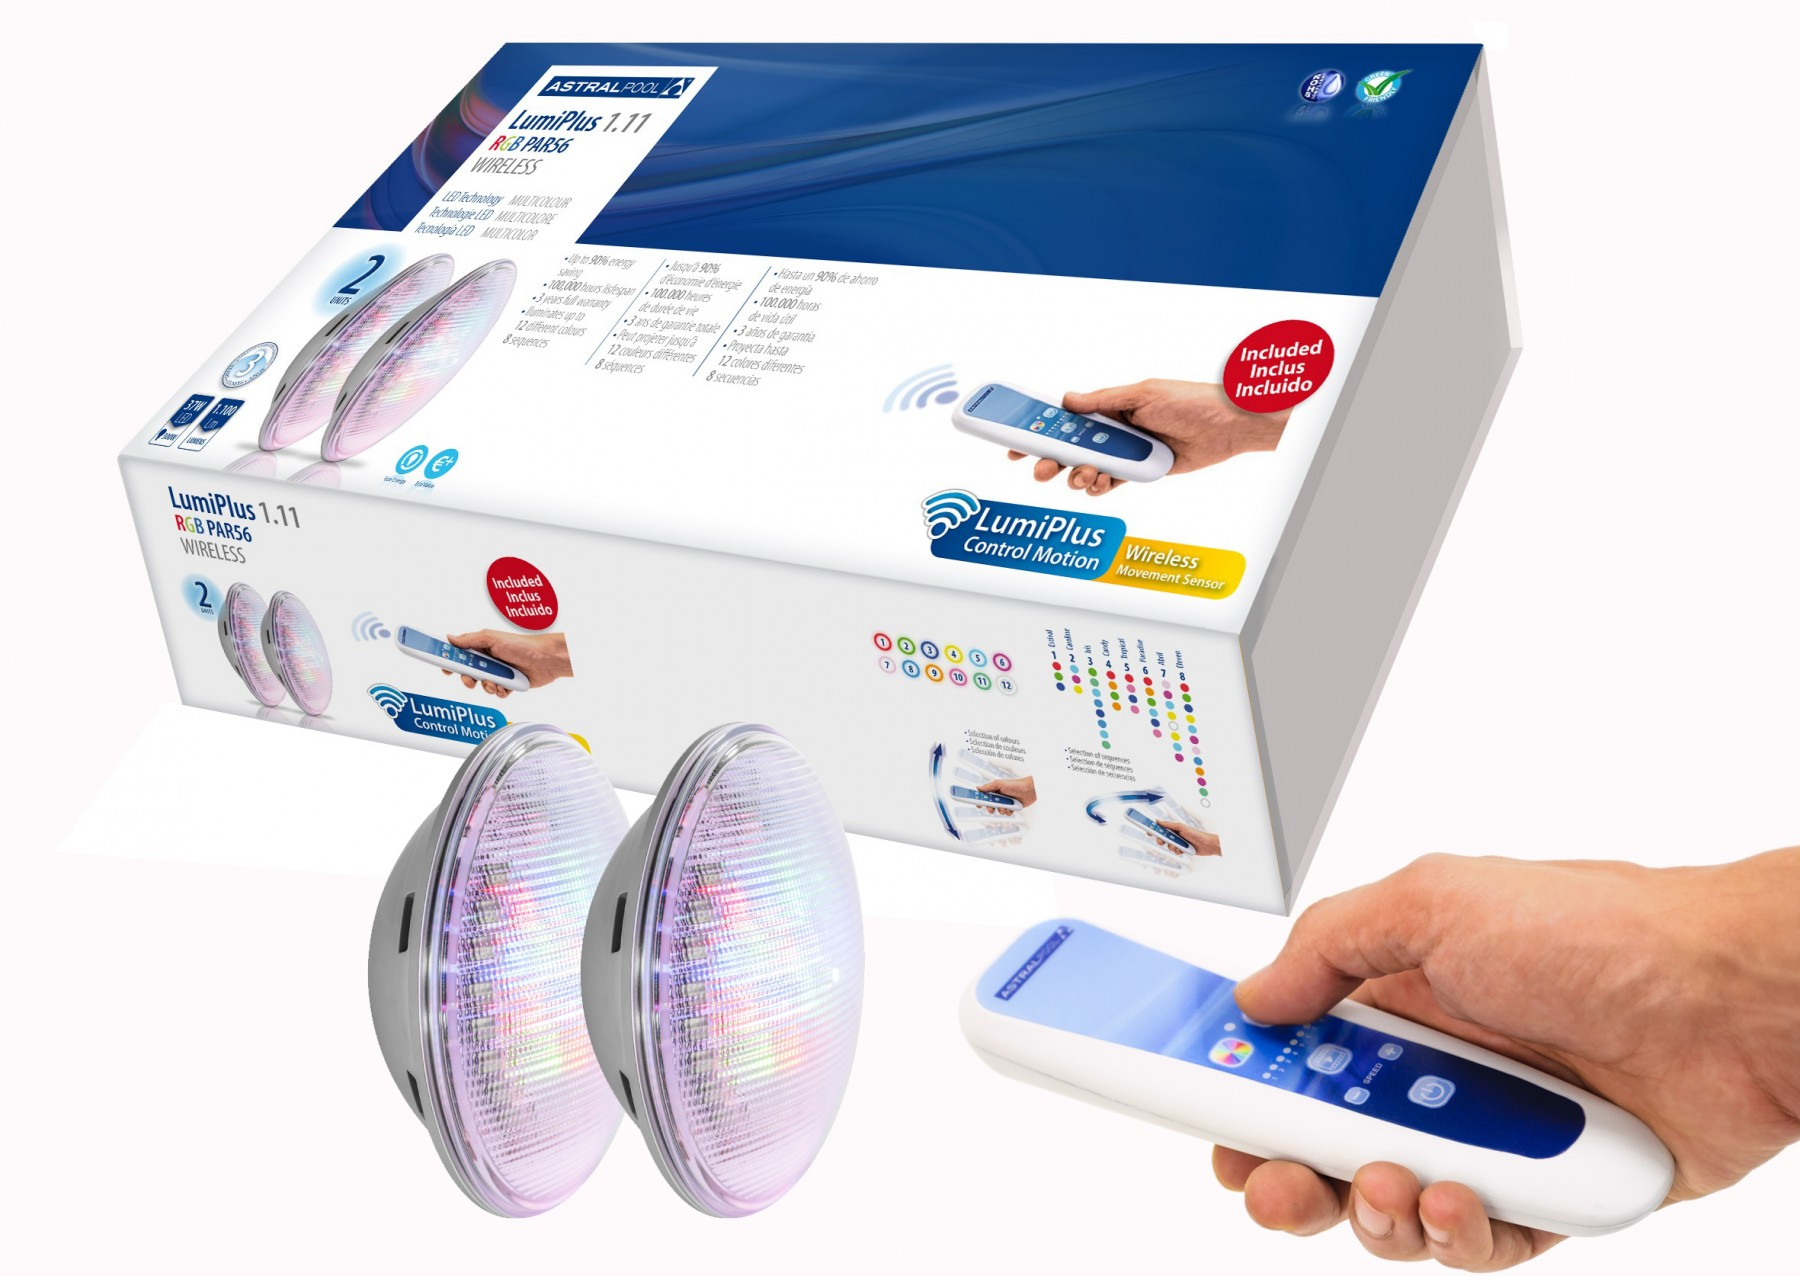 Kit lámpara LED LumiPlus PAR56 V1 Wireless AstralPool